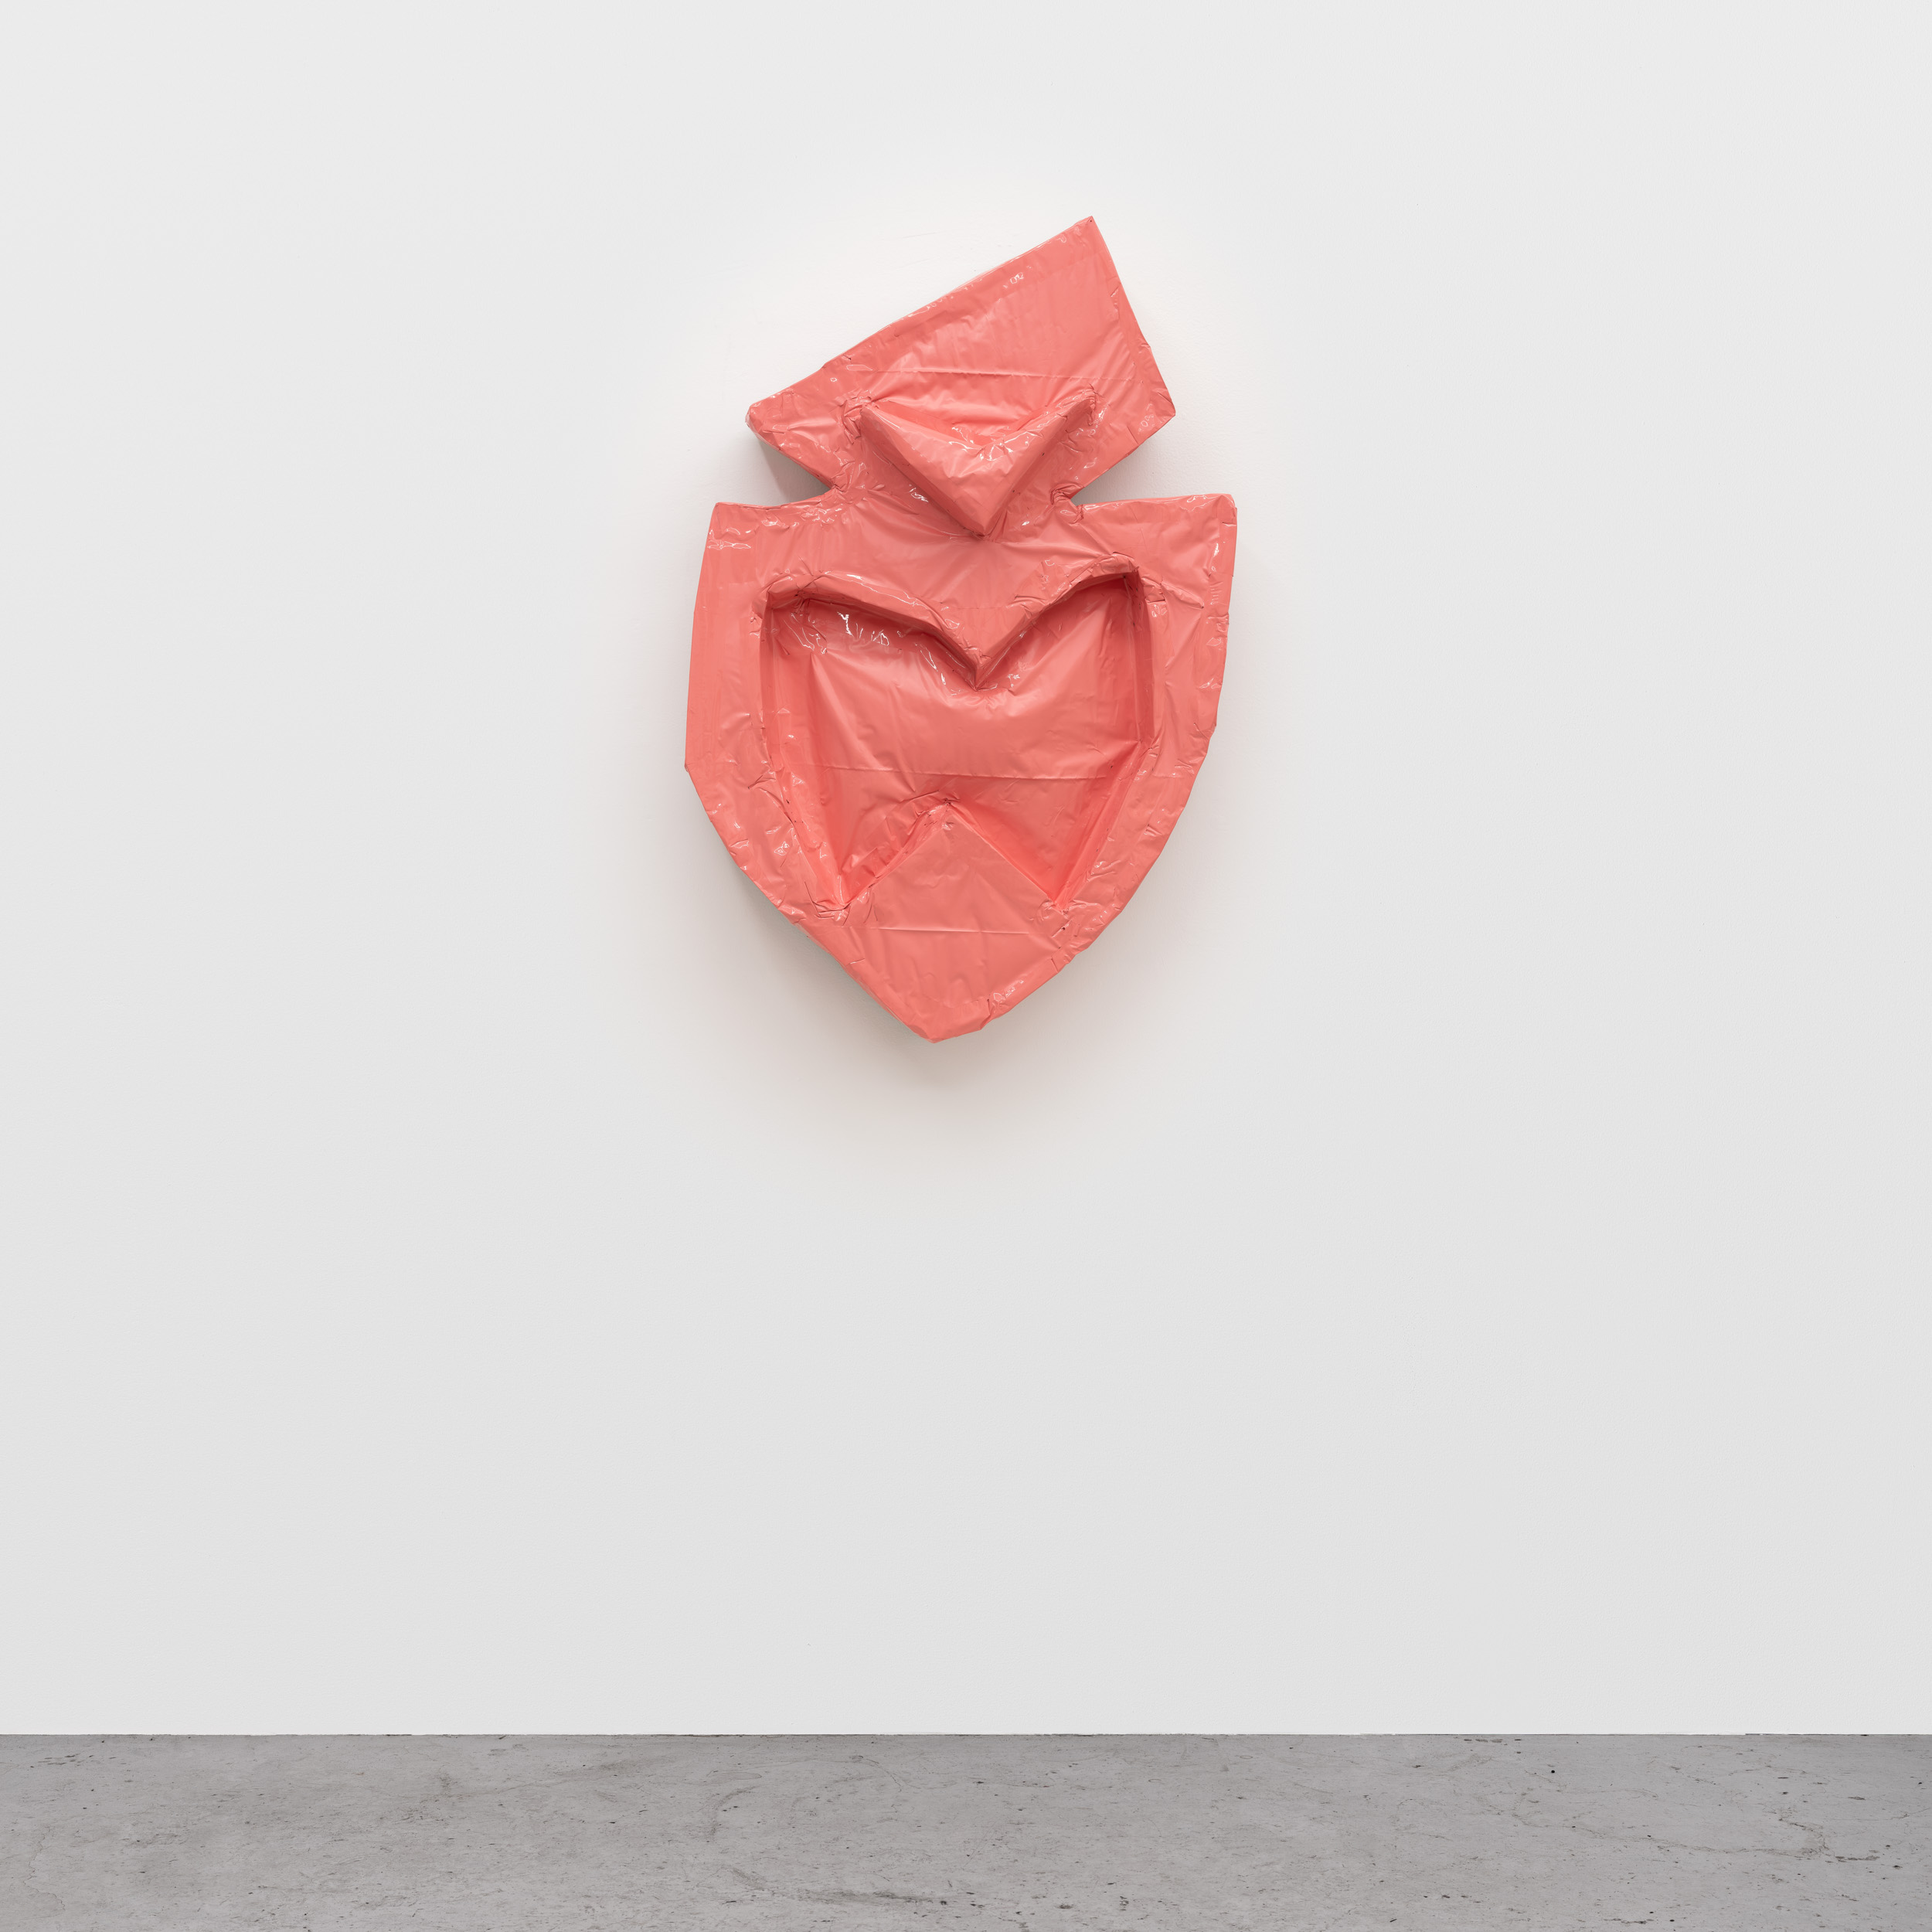 2. Daniel Boccato - Mackface - 2019. epoxy, fiberglass, polyurethane. 55×87×21cm